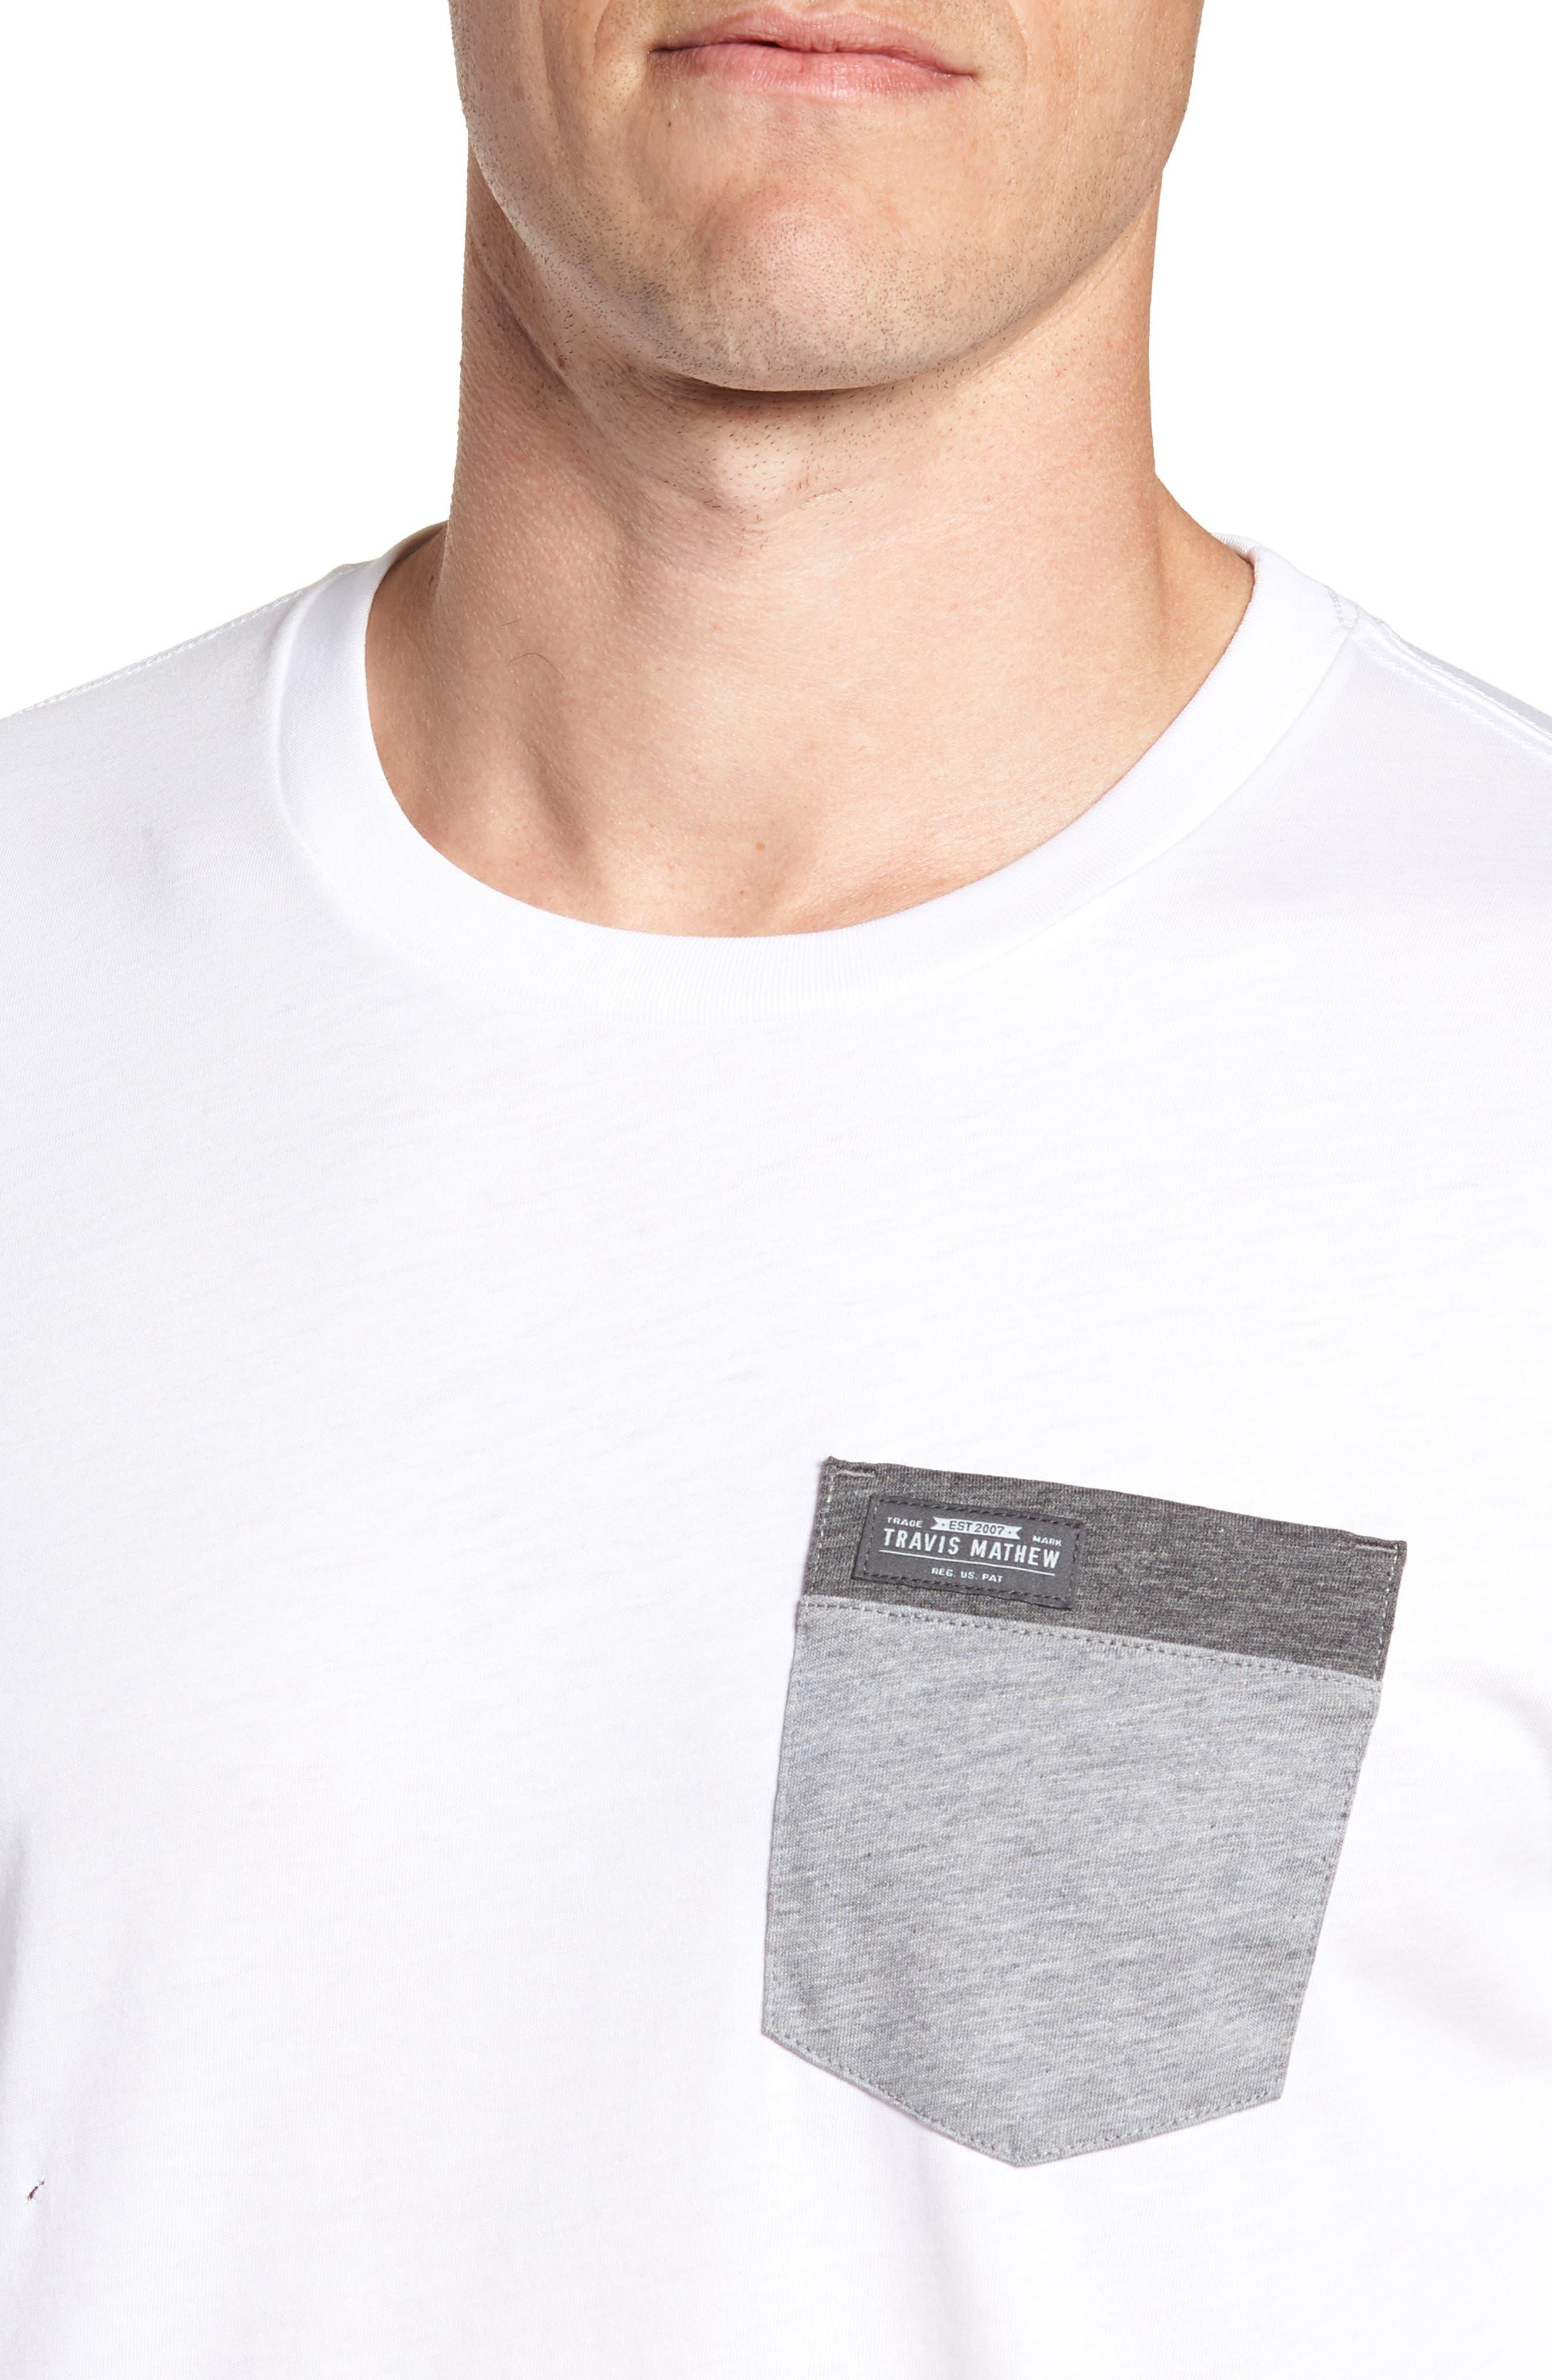 Muska Pocket T-Shirt,                             Alternate thumbnail 4, color,                             100